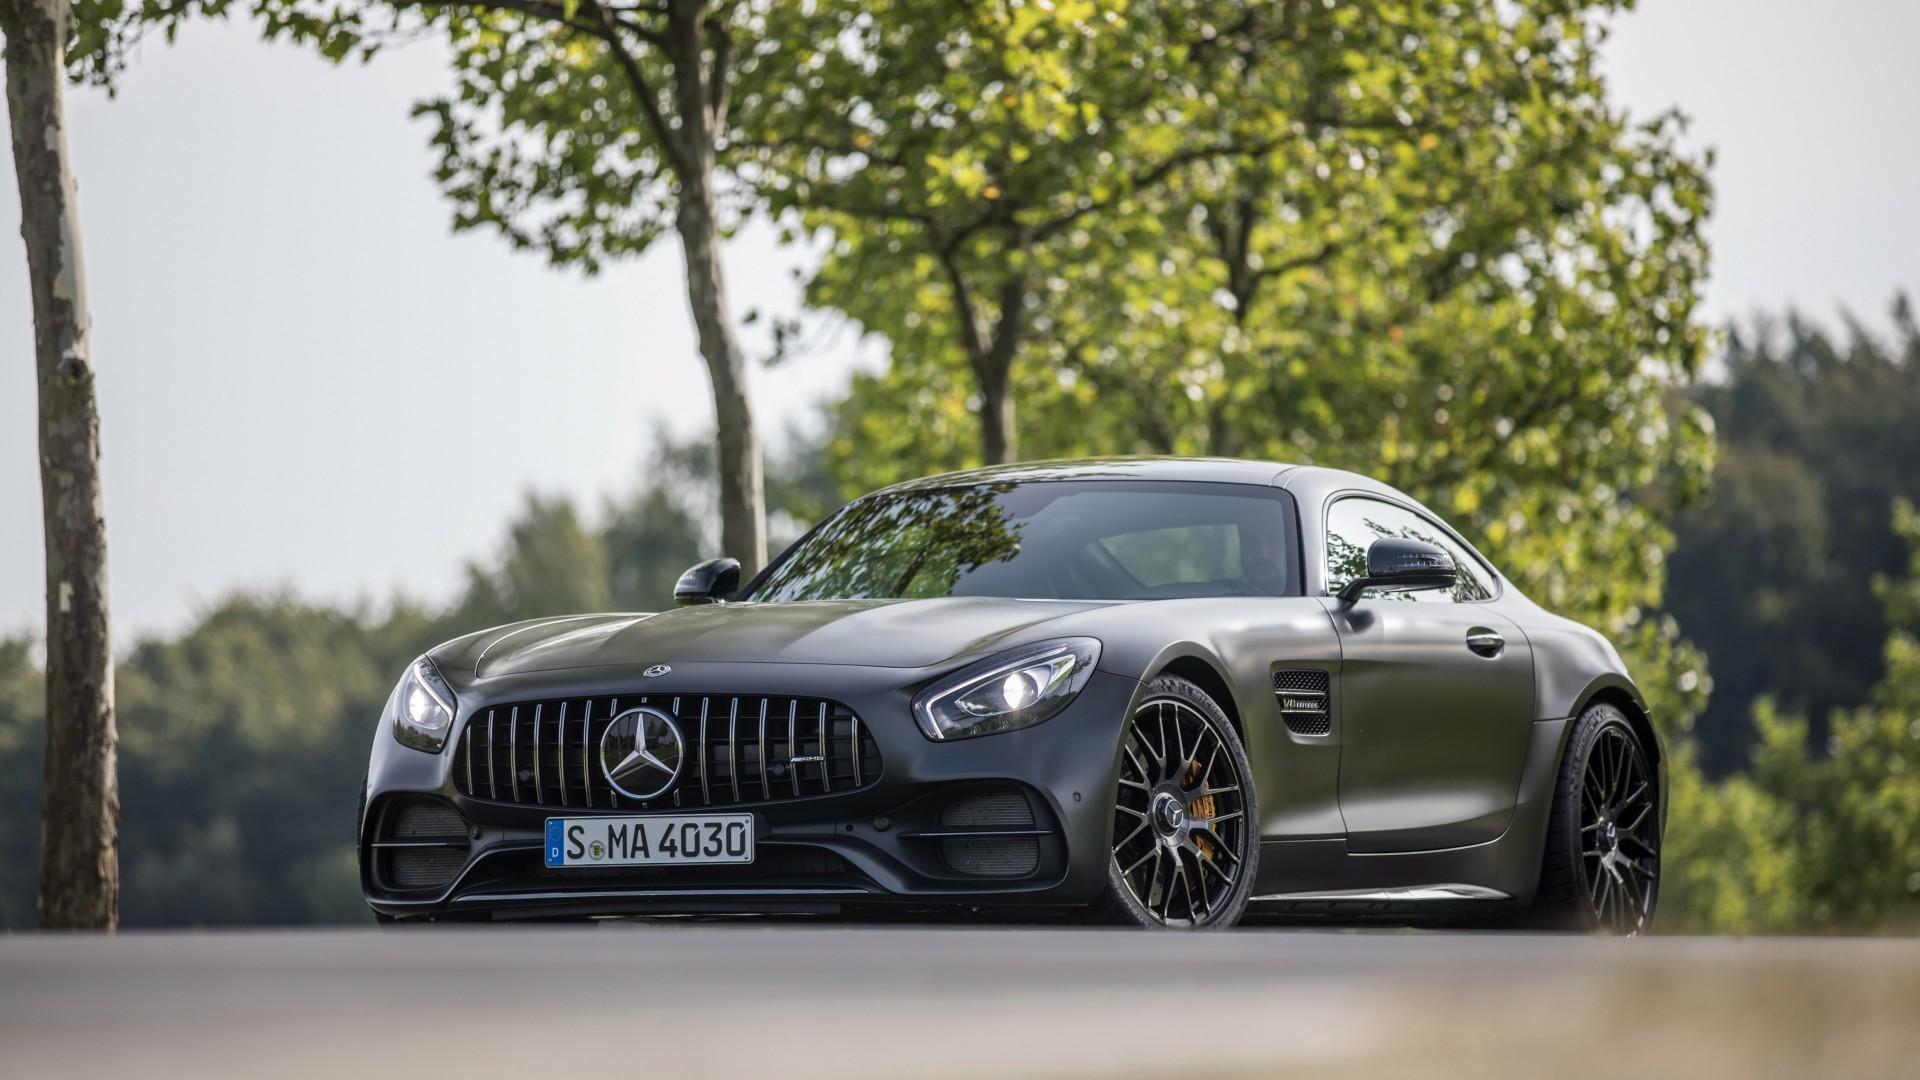 2018 Mercedes Amg Gt C Edition 50 4k Wallpaper Hd Car